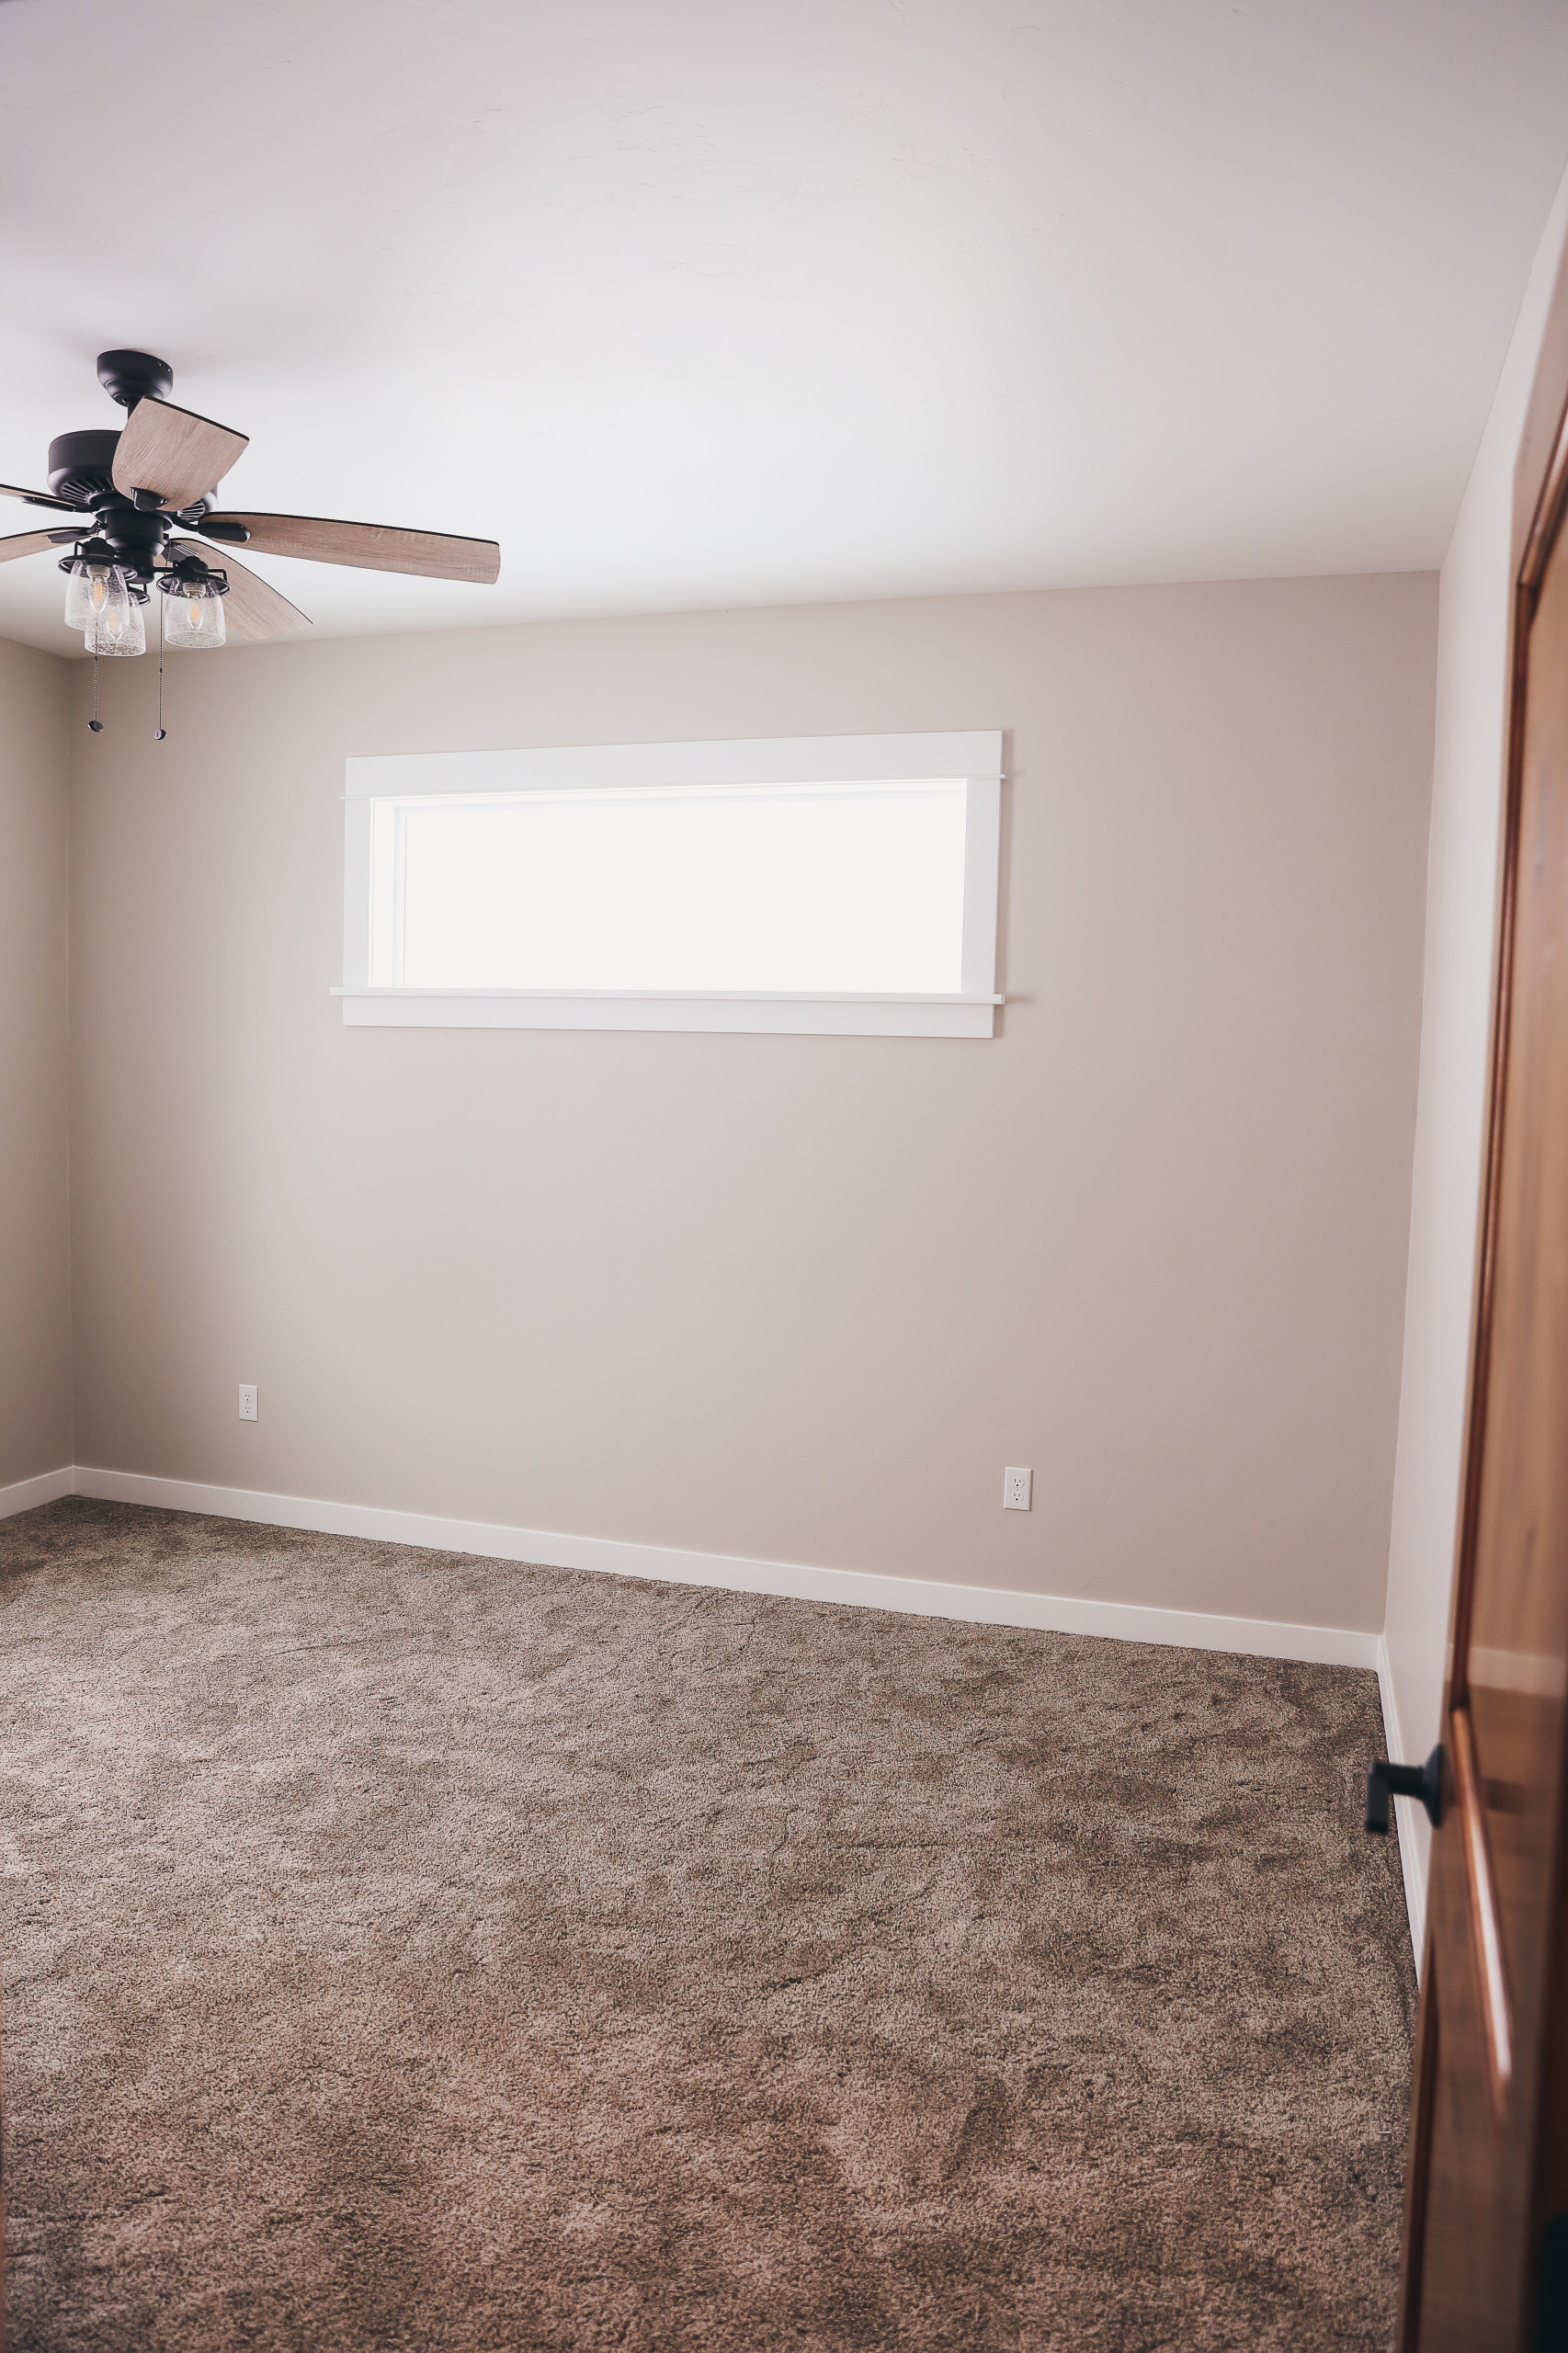 Mattson Home Project